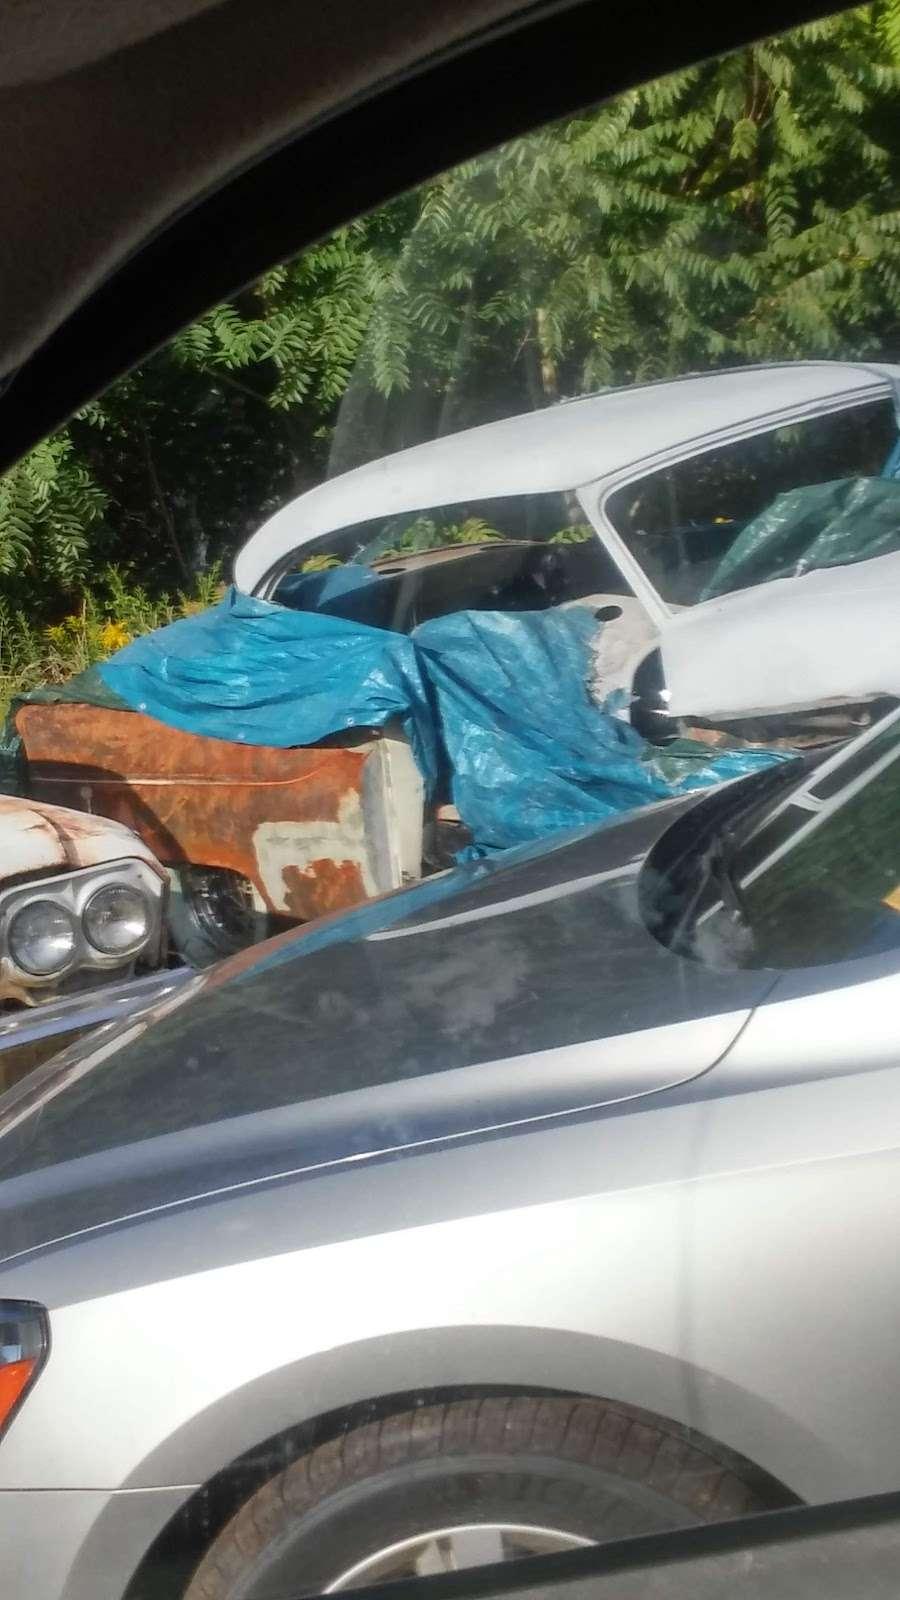 Kennys Auto & Quality Muffler - car repair  | Photo 8 of 10 | Address: 9984 3 Notch Rd, Troy, VA 22974, USA | Phone: (434) 589-5222